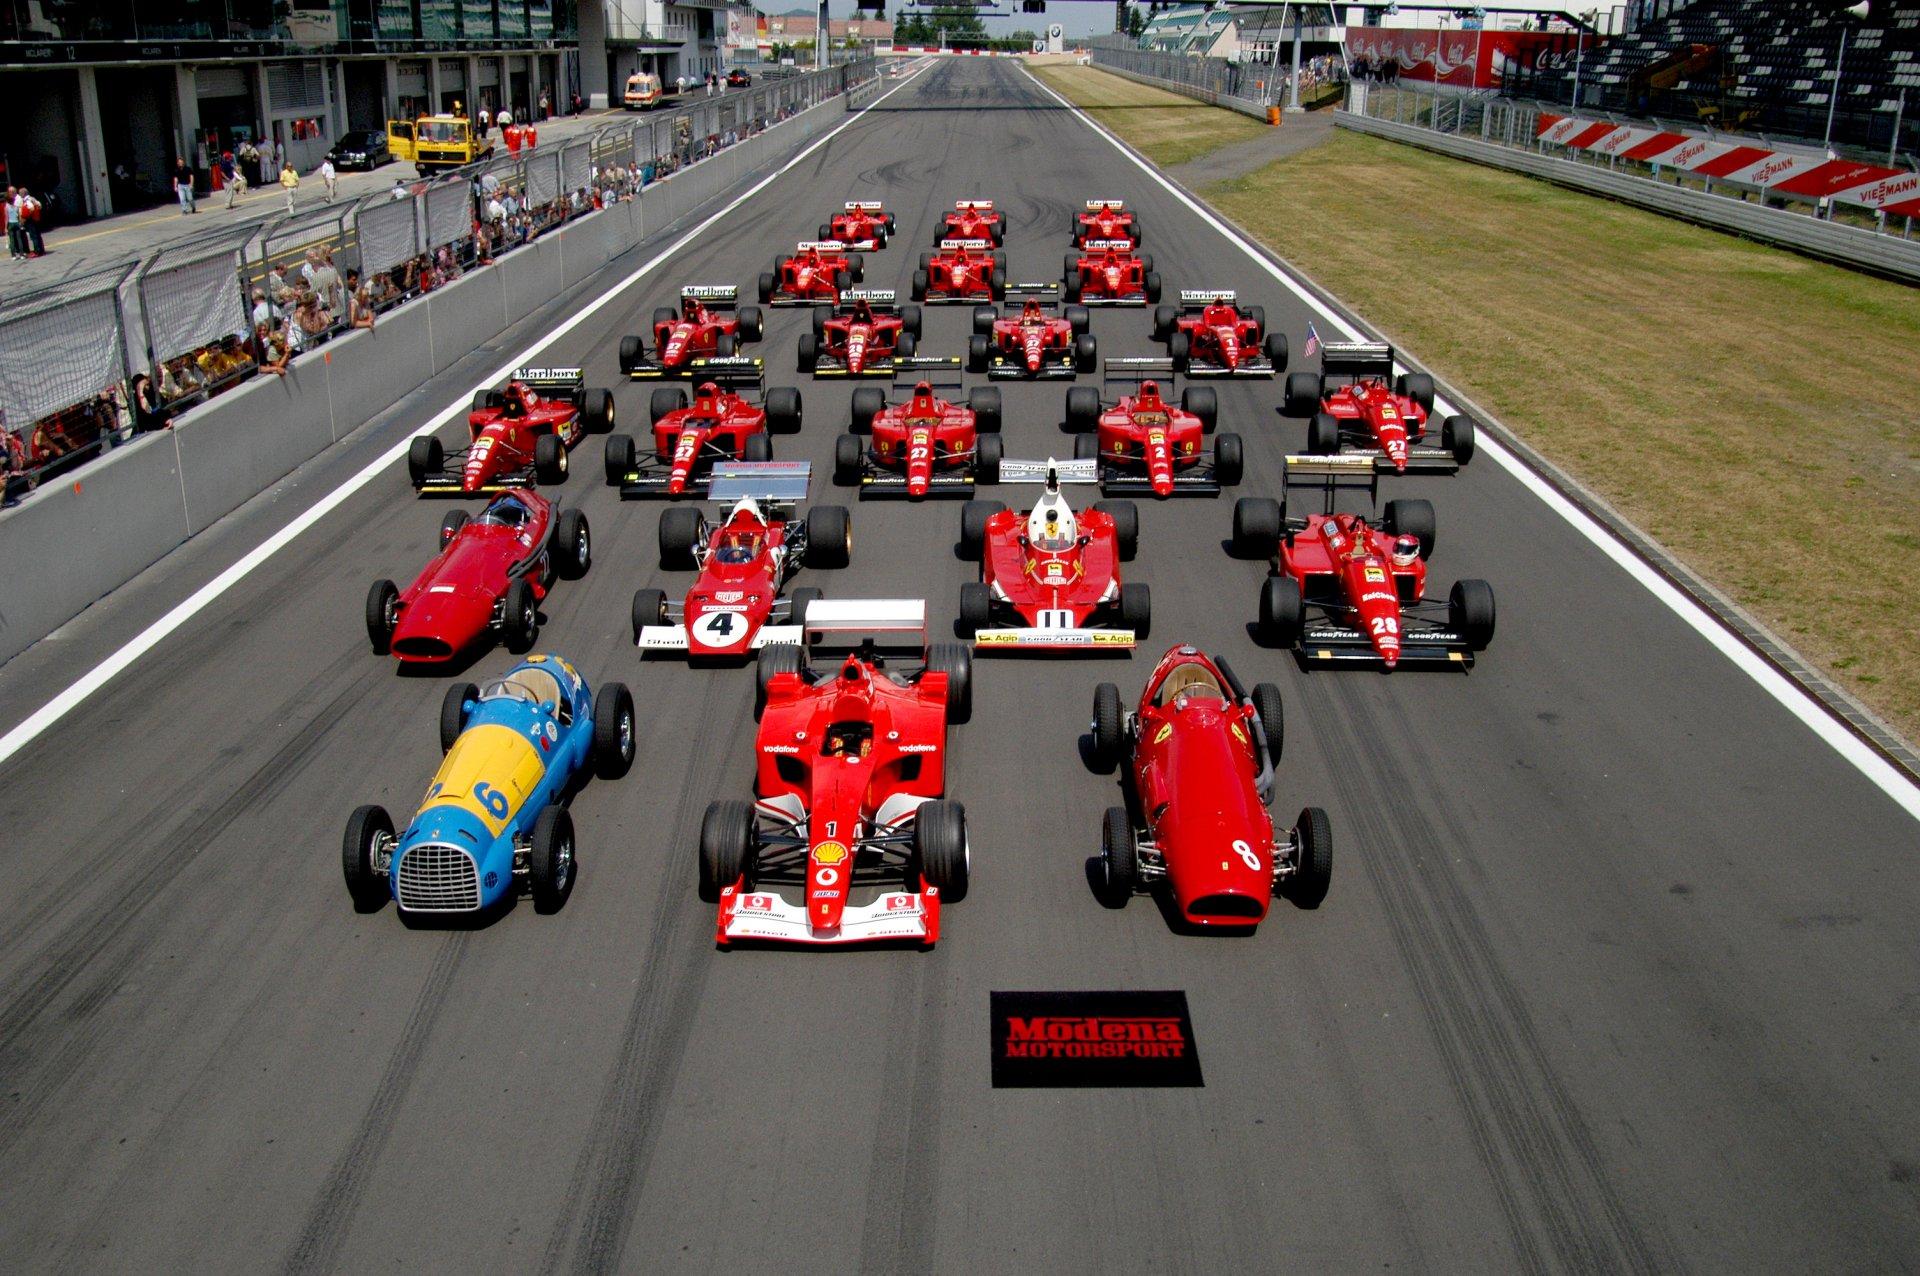 Modena Motorsport Ferrari Track Days. | Photo  Credit: Edwin van Nes